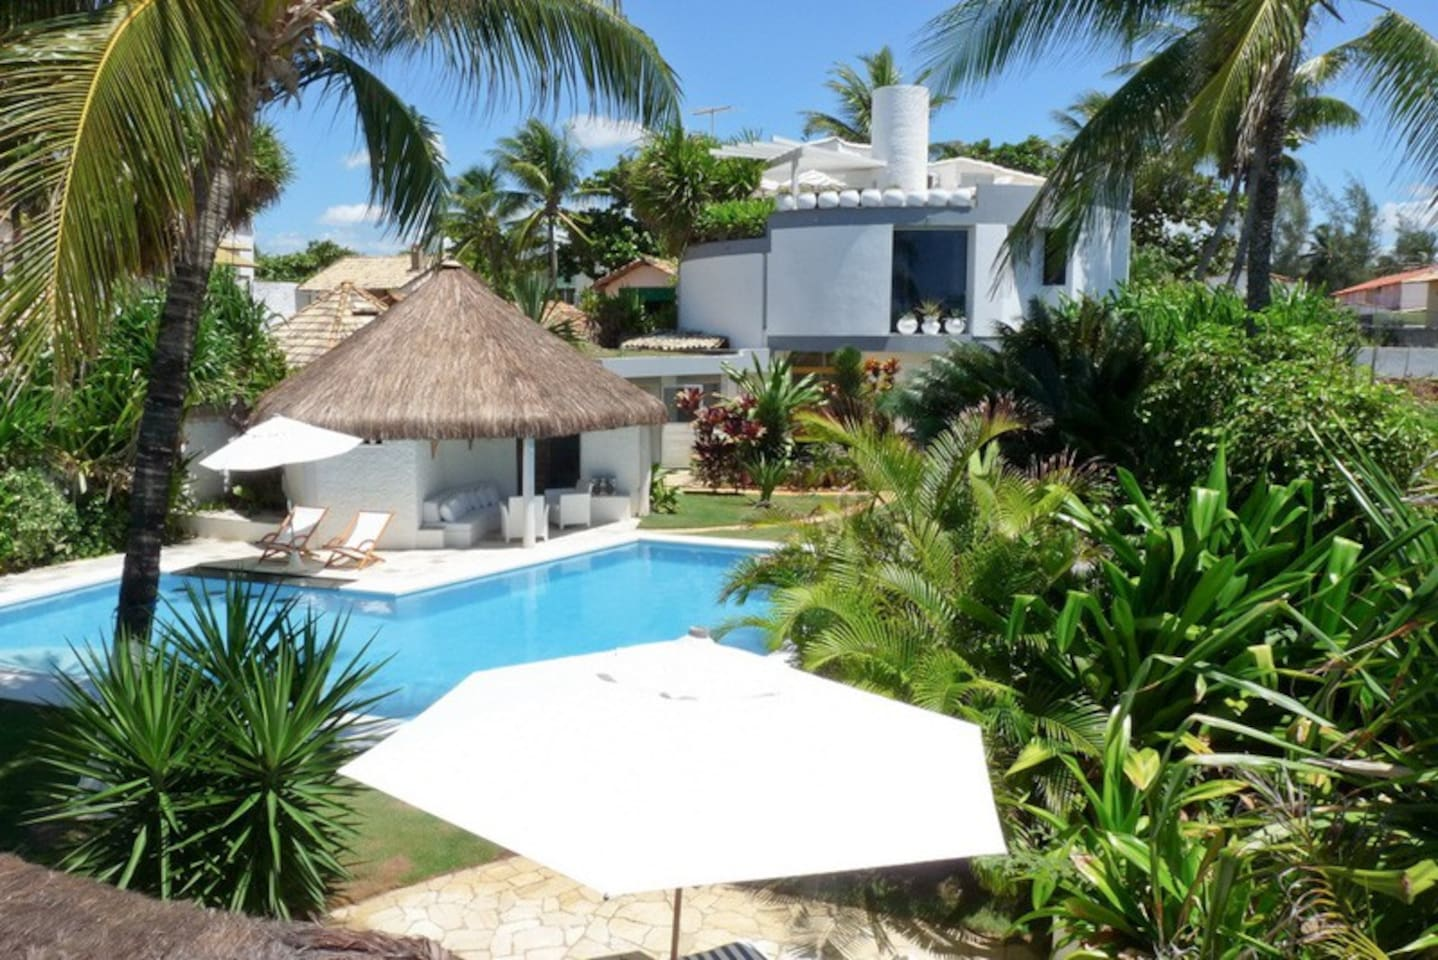 Lush tropical garden, cabana & swimming pool frame this upscale 4 bdrm beach villa